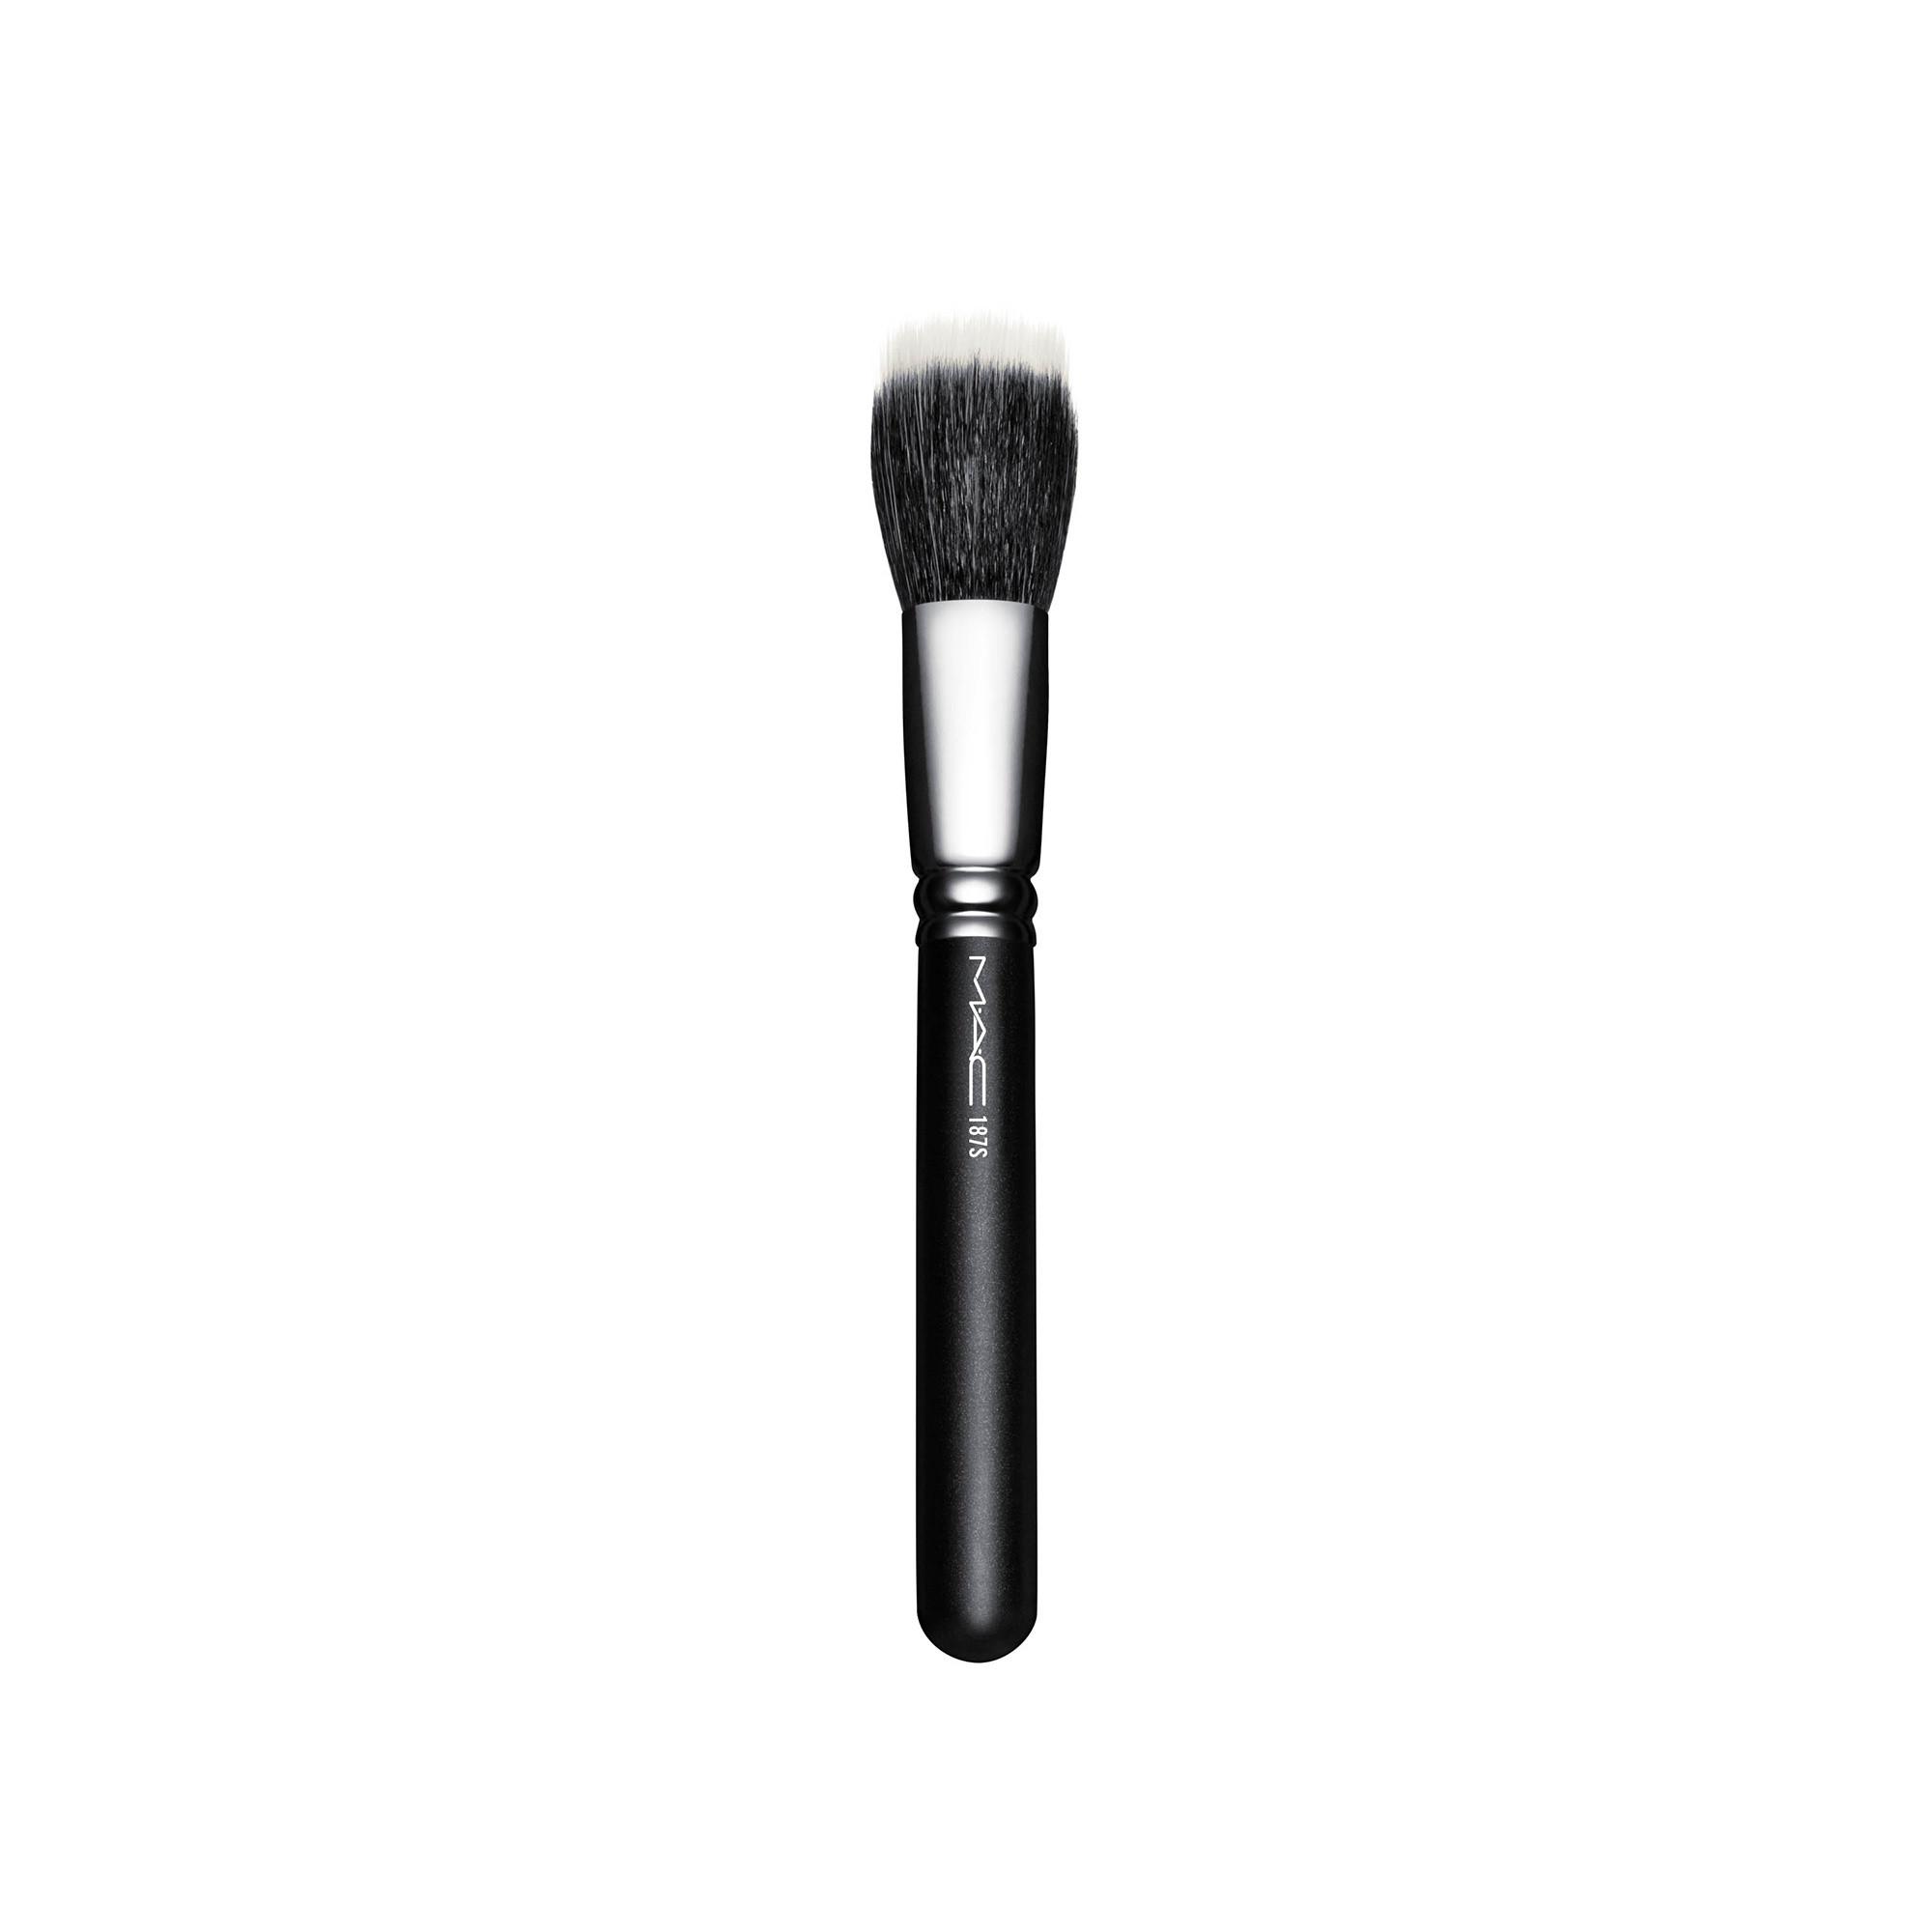 Brush - 130S Short Duo Fibre, Nero, large image number 0